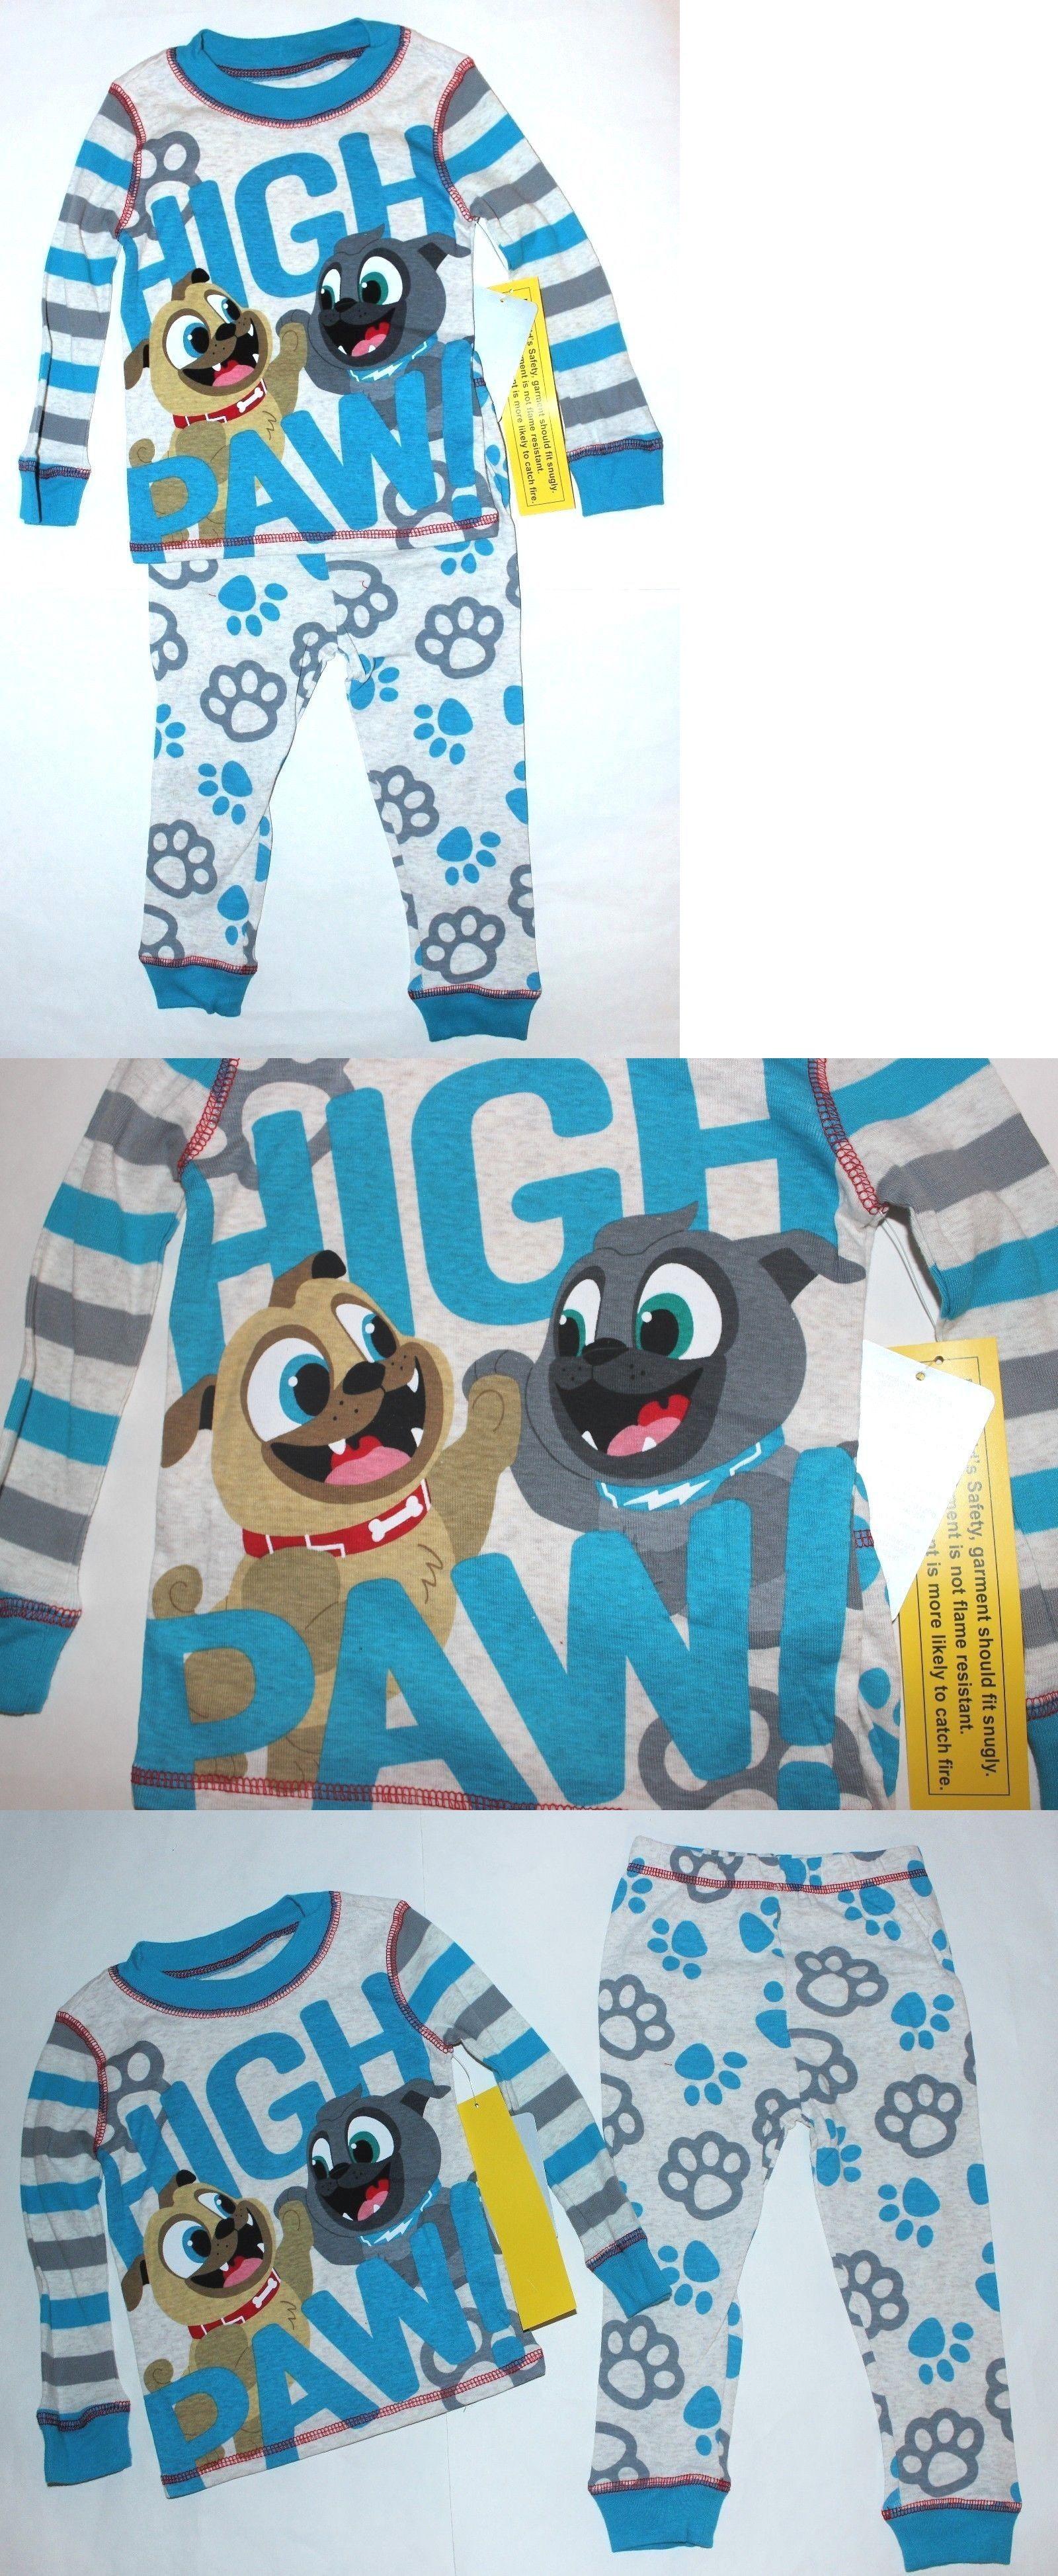 0d5494737f39 Sleepwear 147336  Boys 2T Or 4T Puppy Dog Pals Pajamas Basic Cotton ...